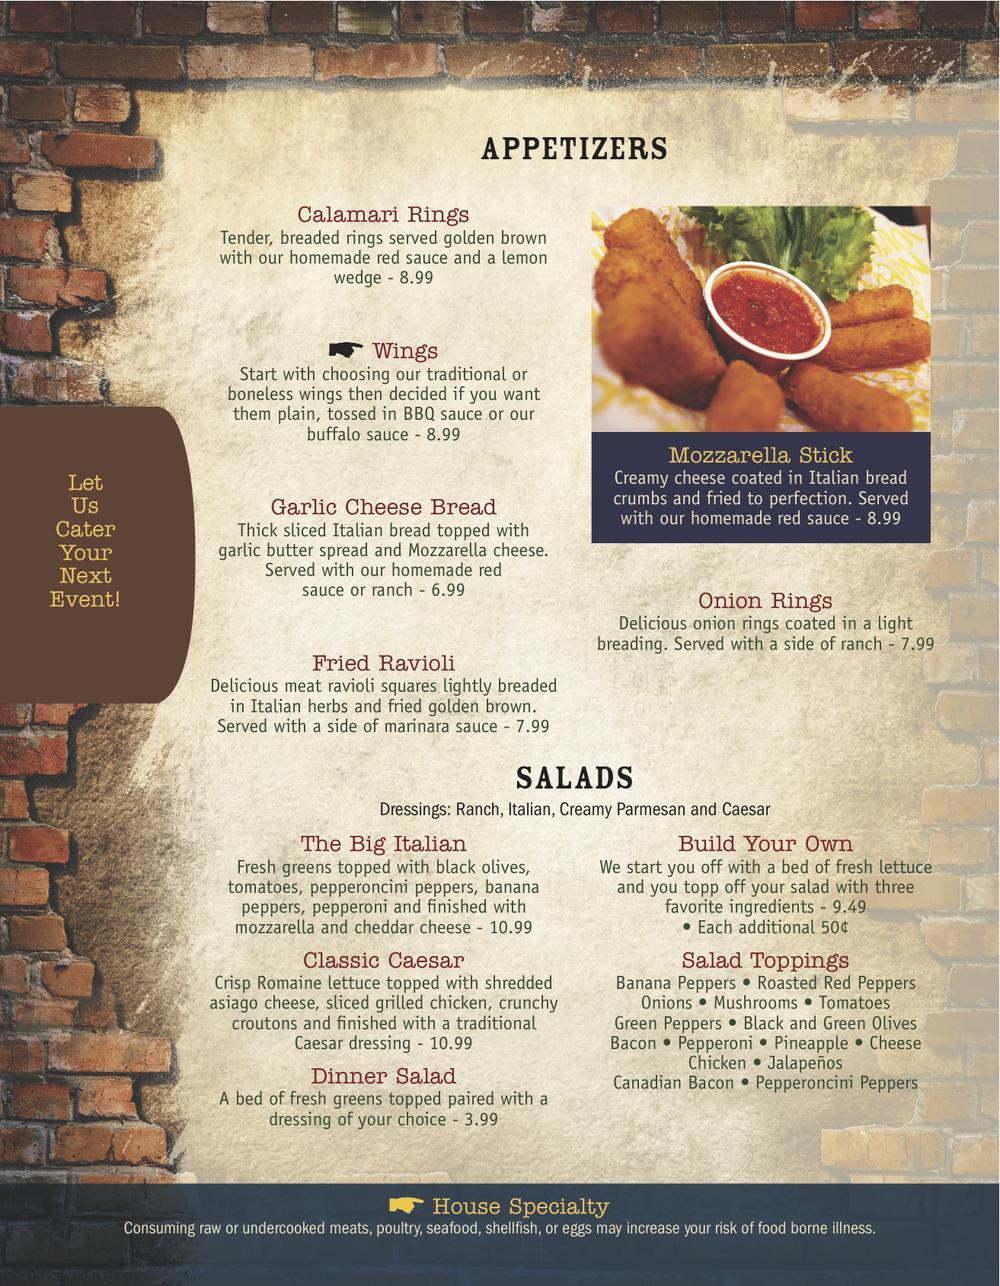 Aptzr and Salads